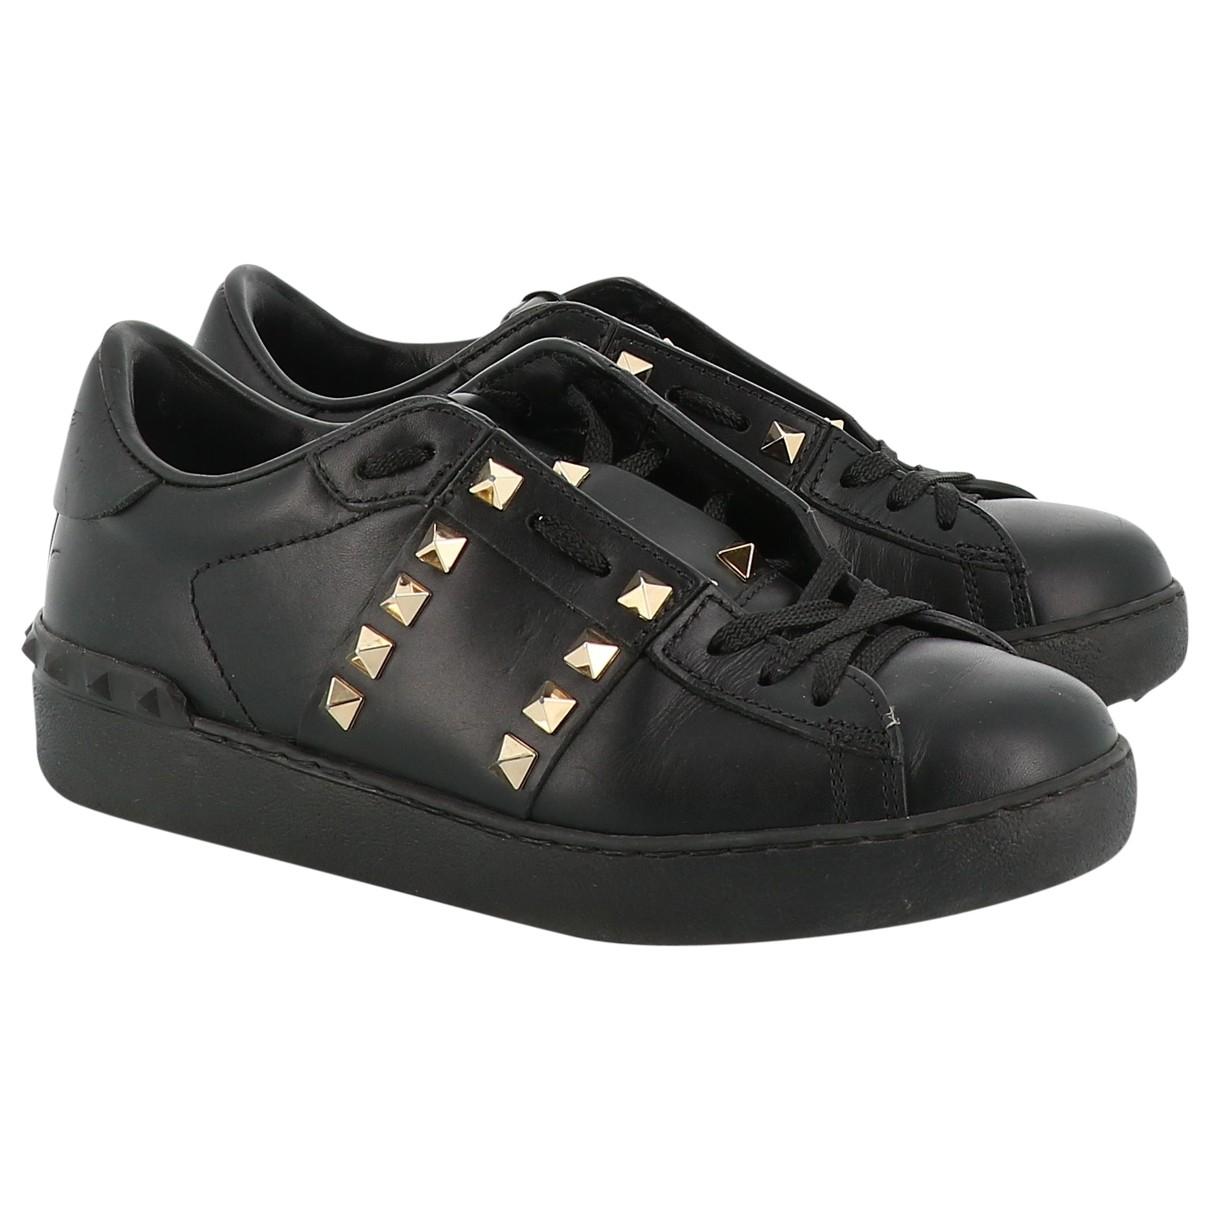 Valentino Garavani Rockstud Black Leather Trainers for Women 35.5 EU